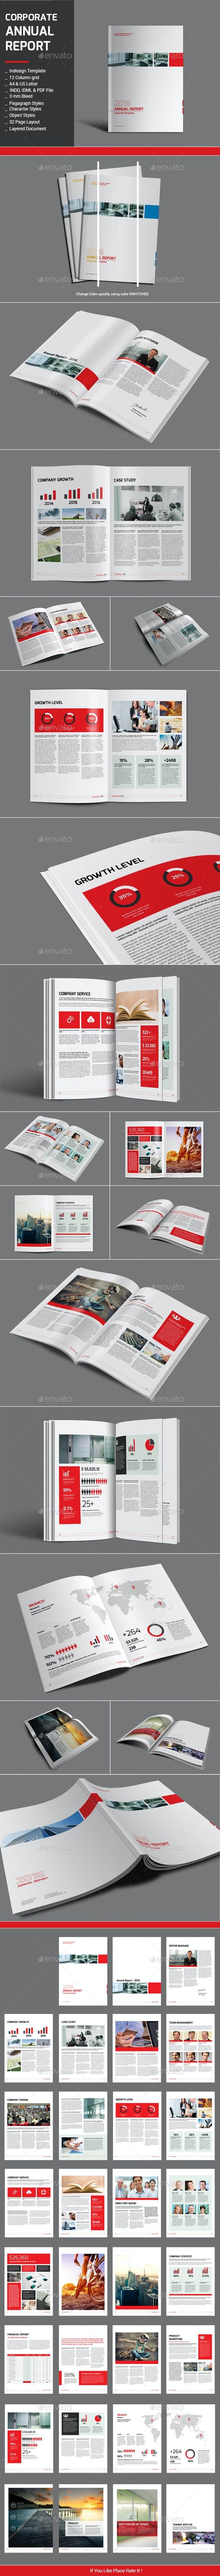 Corporate Annual Report - Informational Brochures